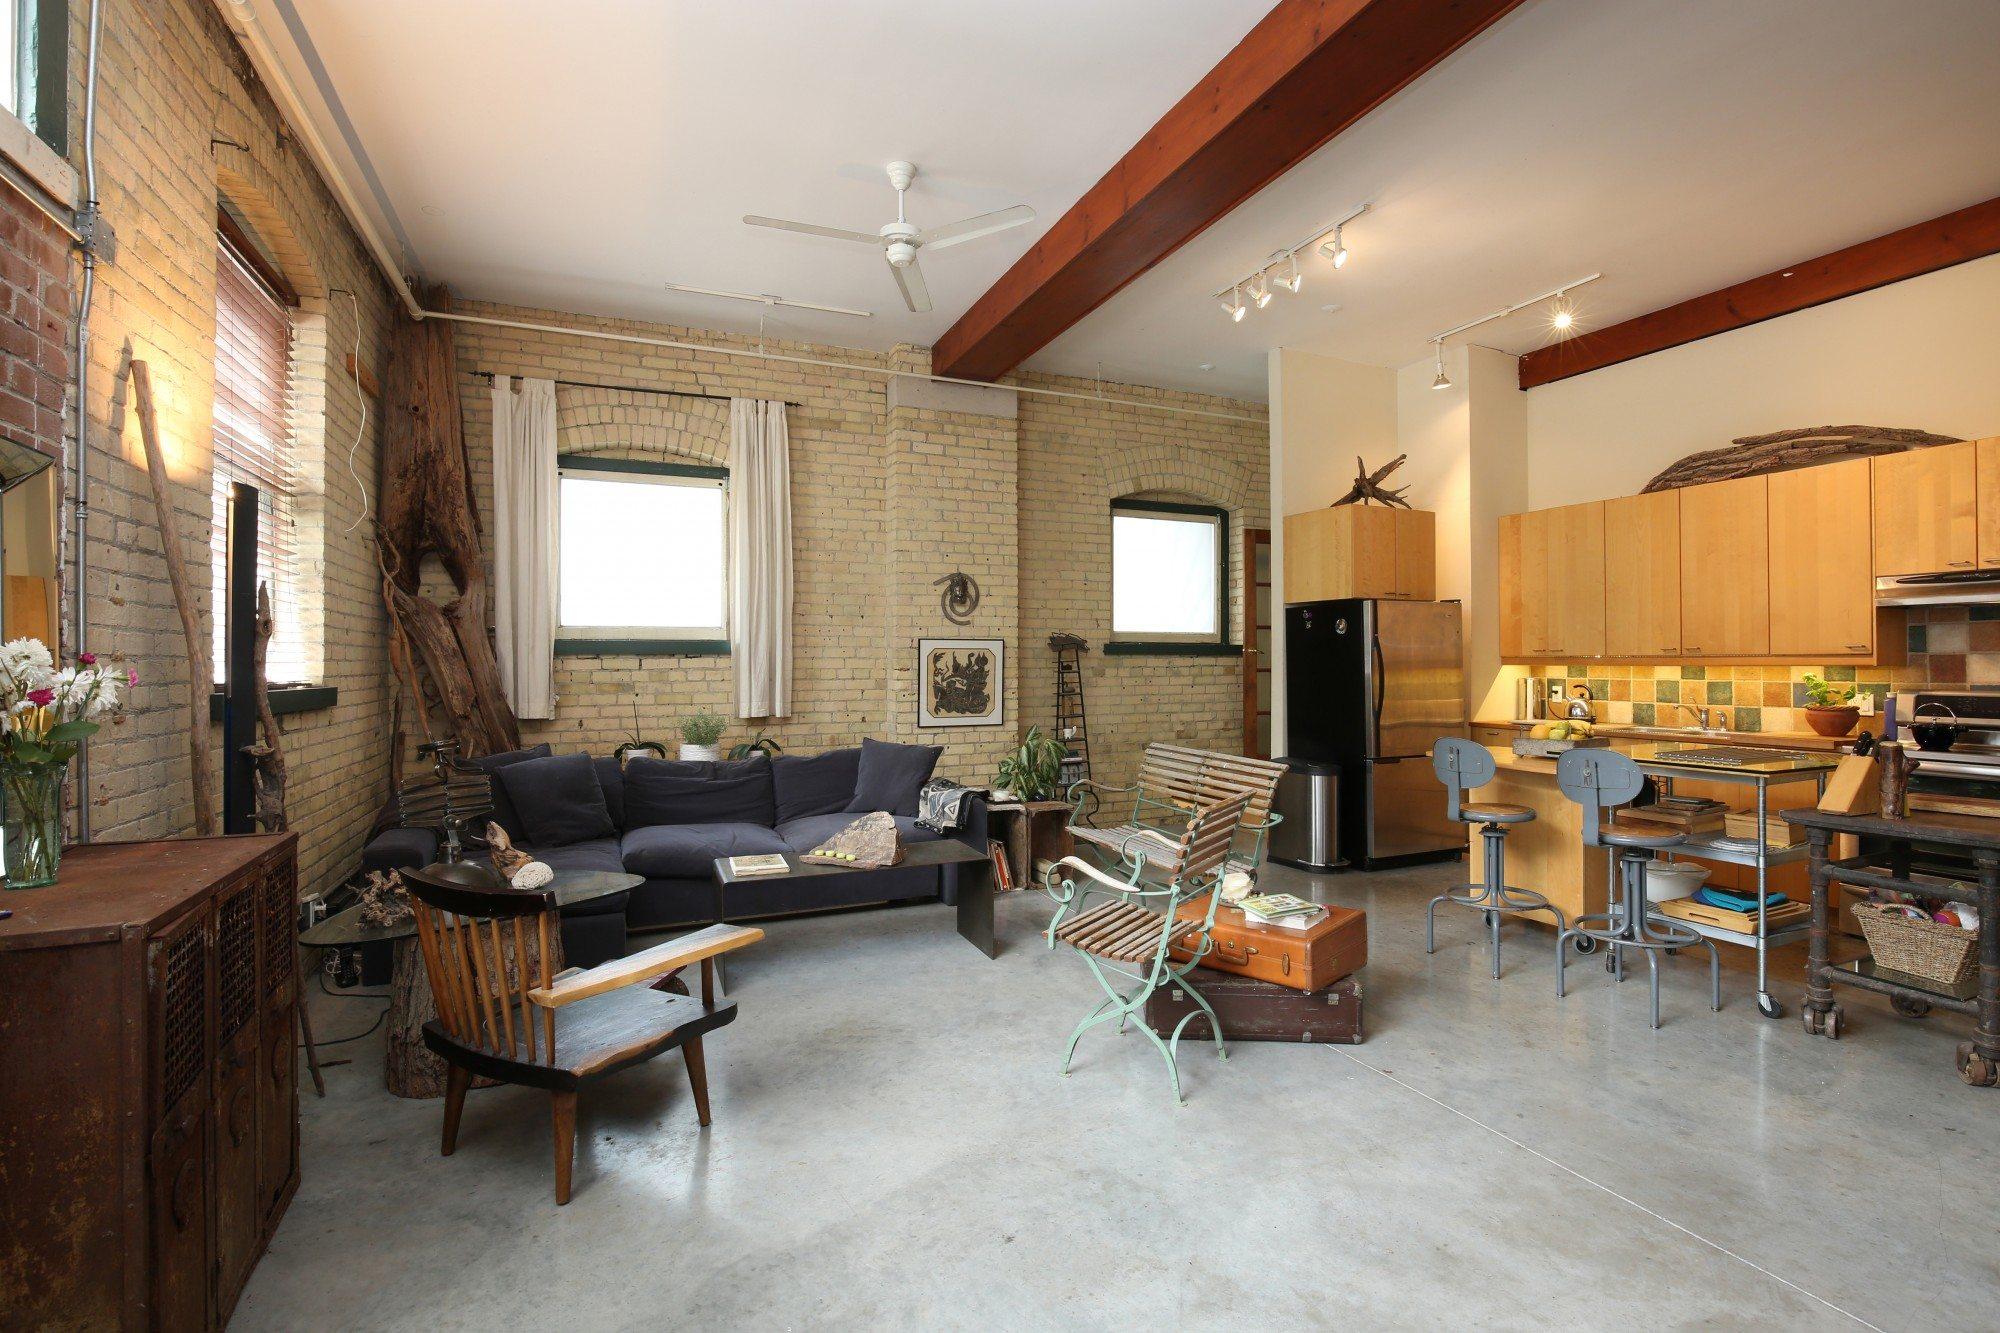 toronto-house-for-sale-154-shuter-street-3